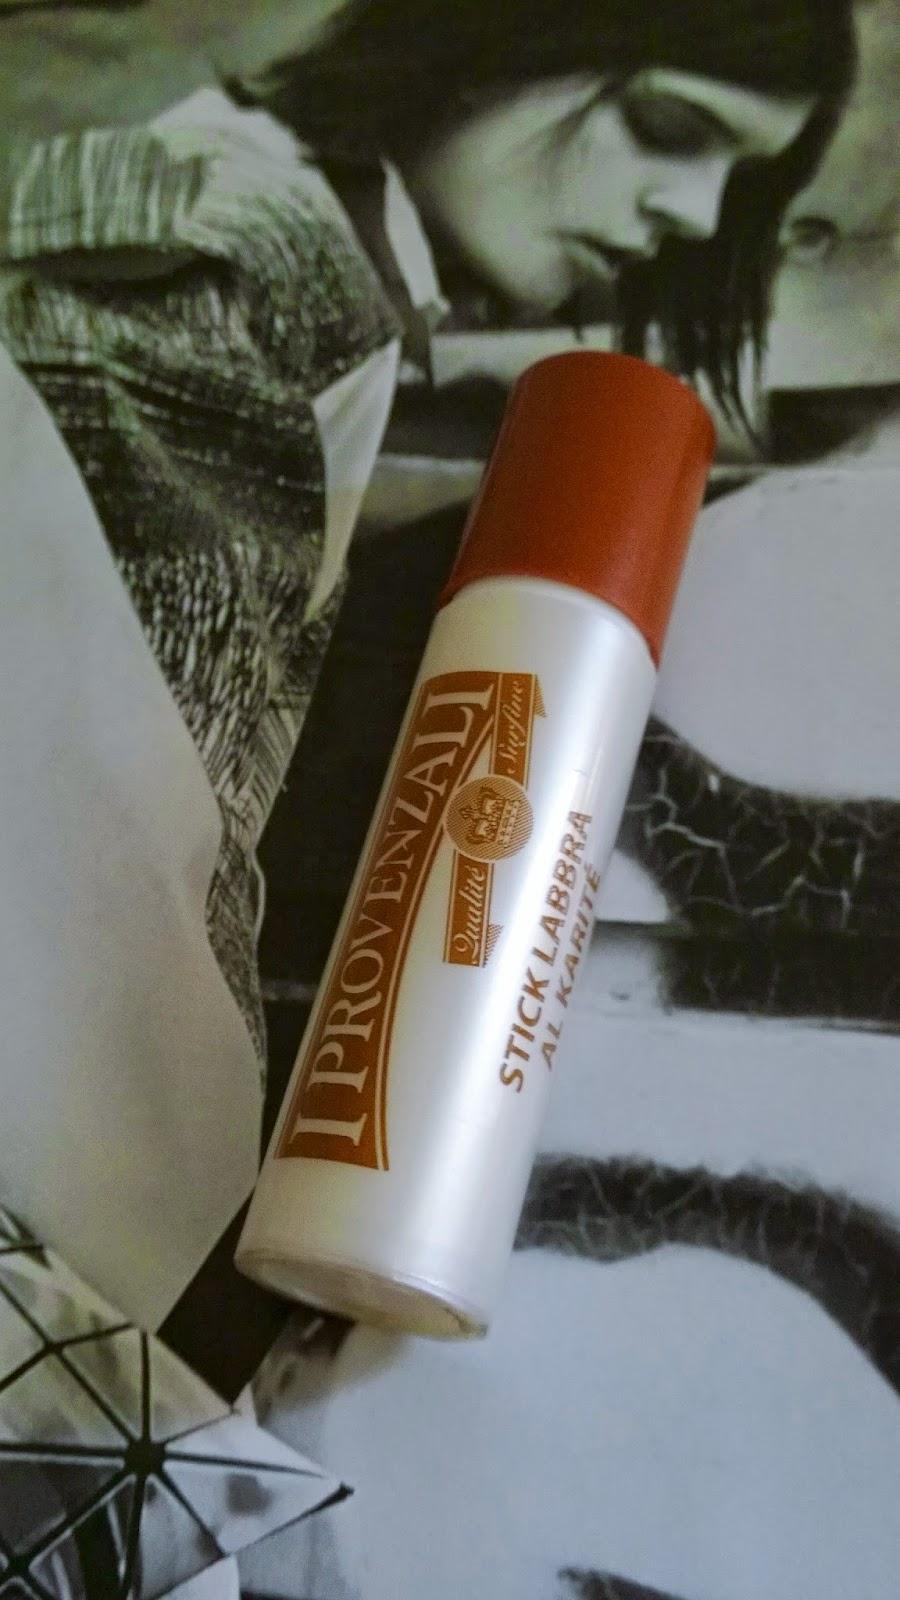 Stick Labbra - I Provenziali